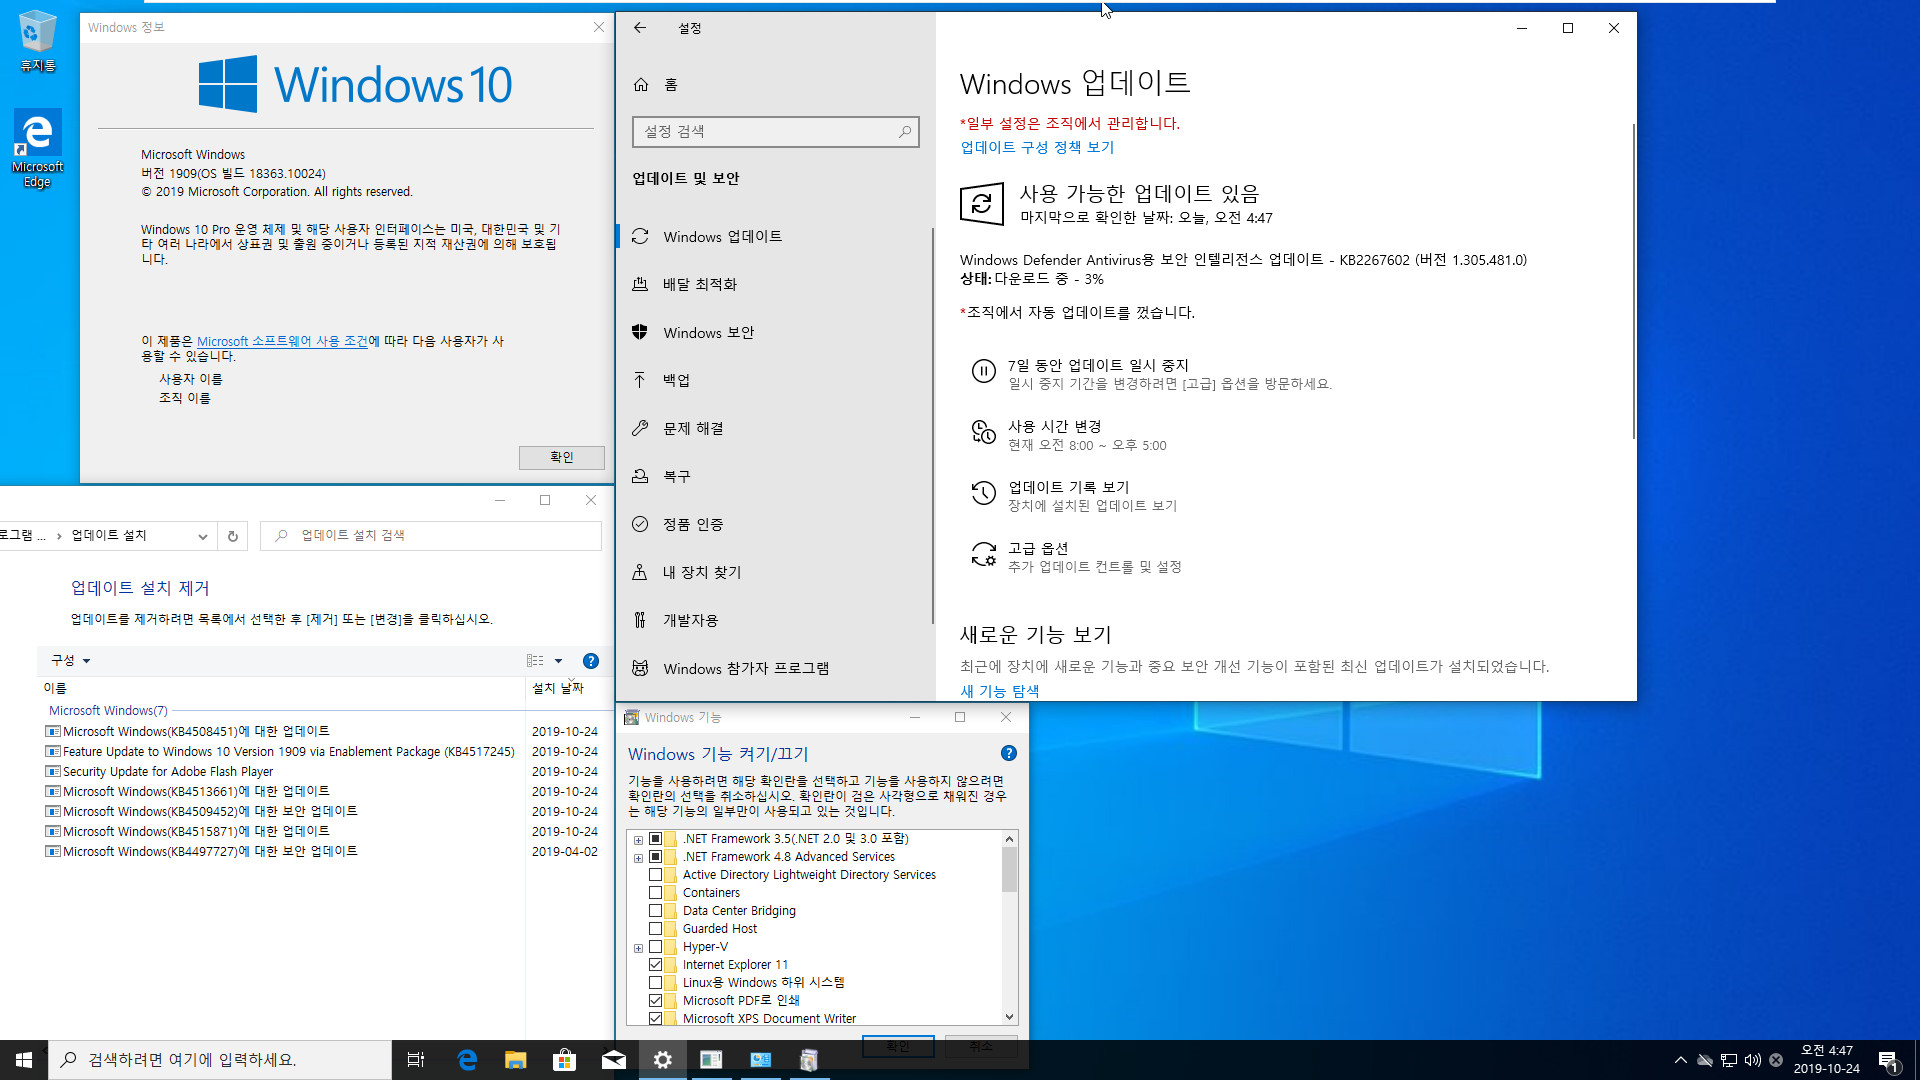 Windows 10 19H2 (버전 1909, OS 빌드 18363.10024 )를 업그레이드 설치 목적으로 install.wim 통합중 입니다 - 64비트 확인 2019-10-24_044738.jpg